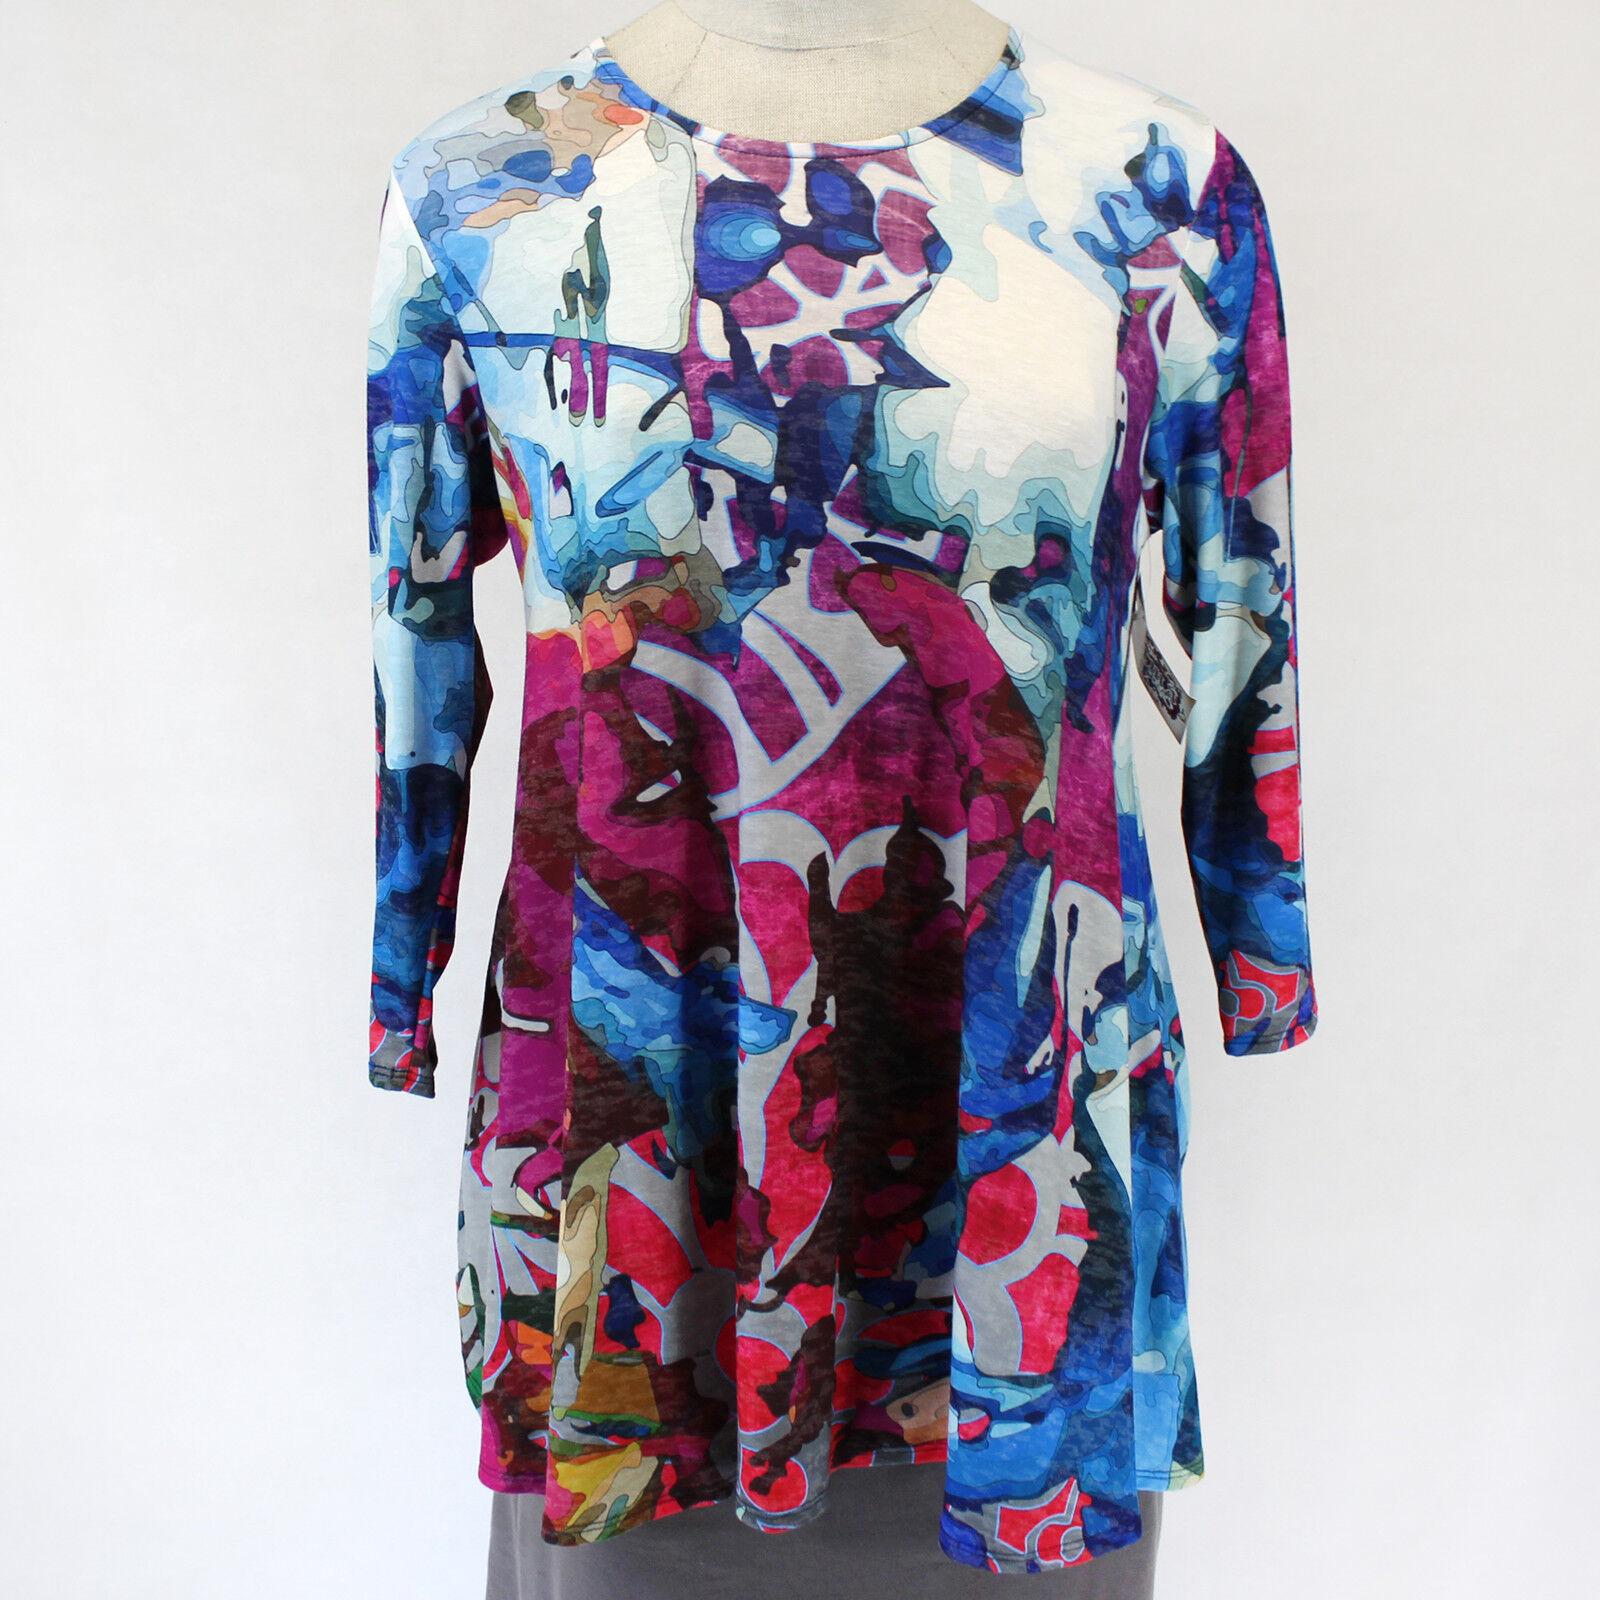 NEW Amma Design Plus Picasso Inspirot Art Spring Blouse Multi-Farbe Top 3X USA